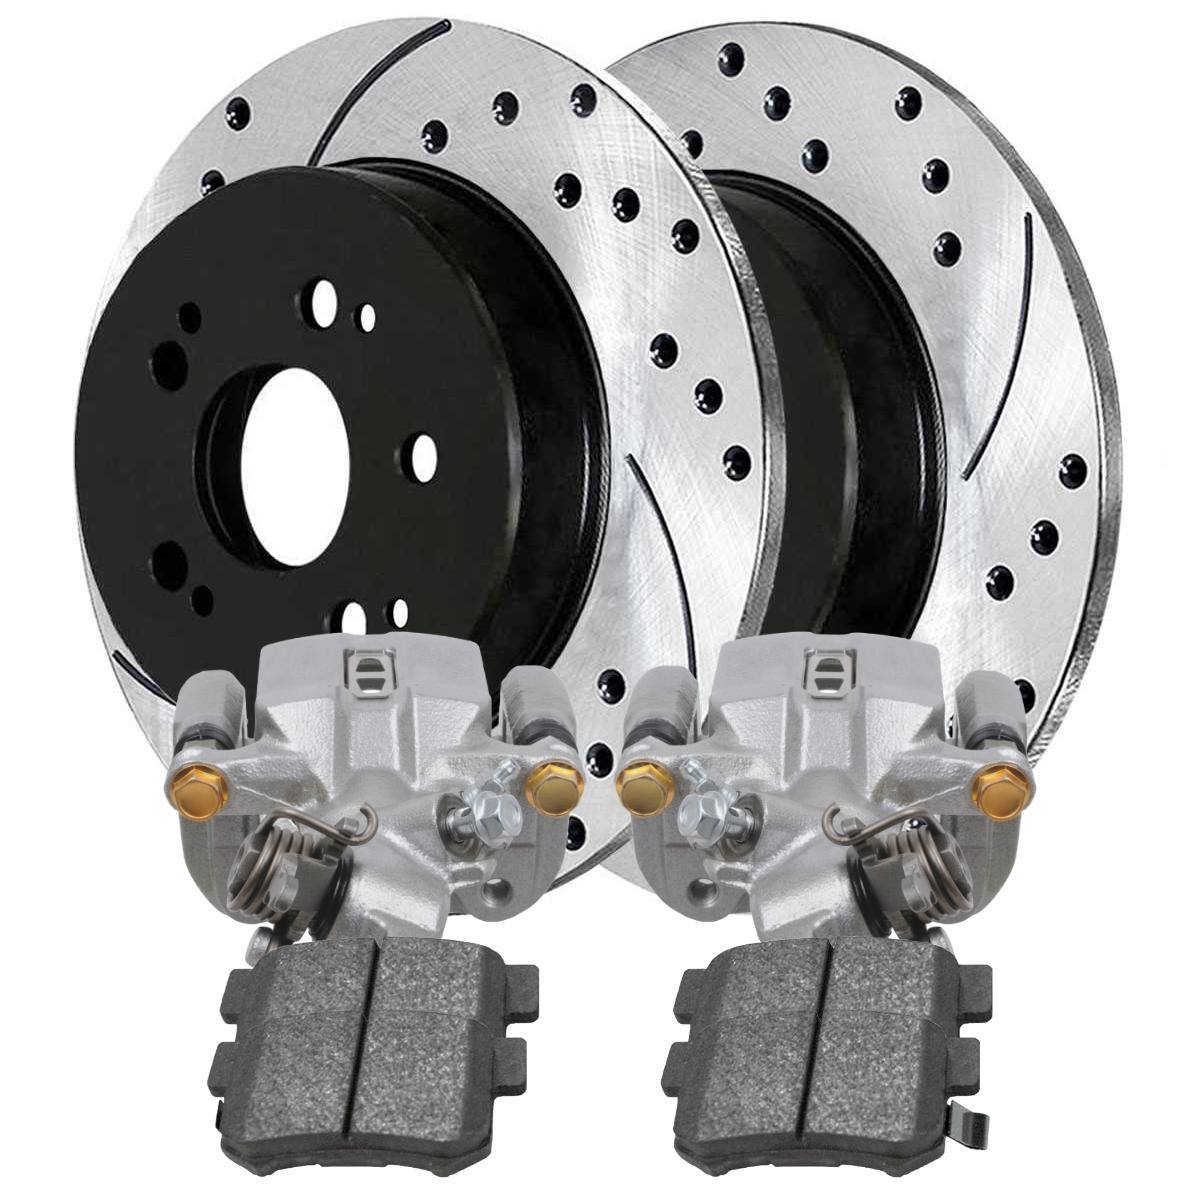 Auto Shack PR41481DSZLR-BC30298 Rear Disc Brake Caliper and Performance Rotor Bundle Silver